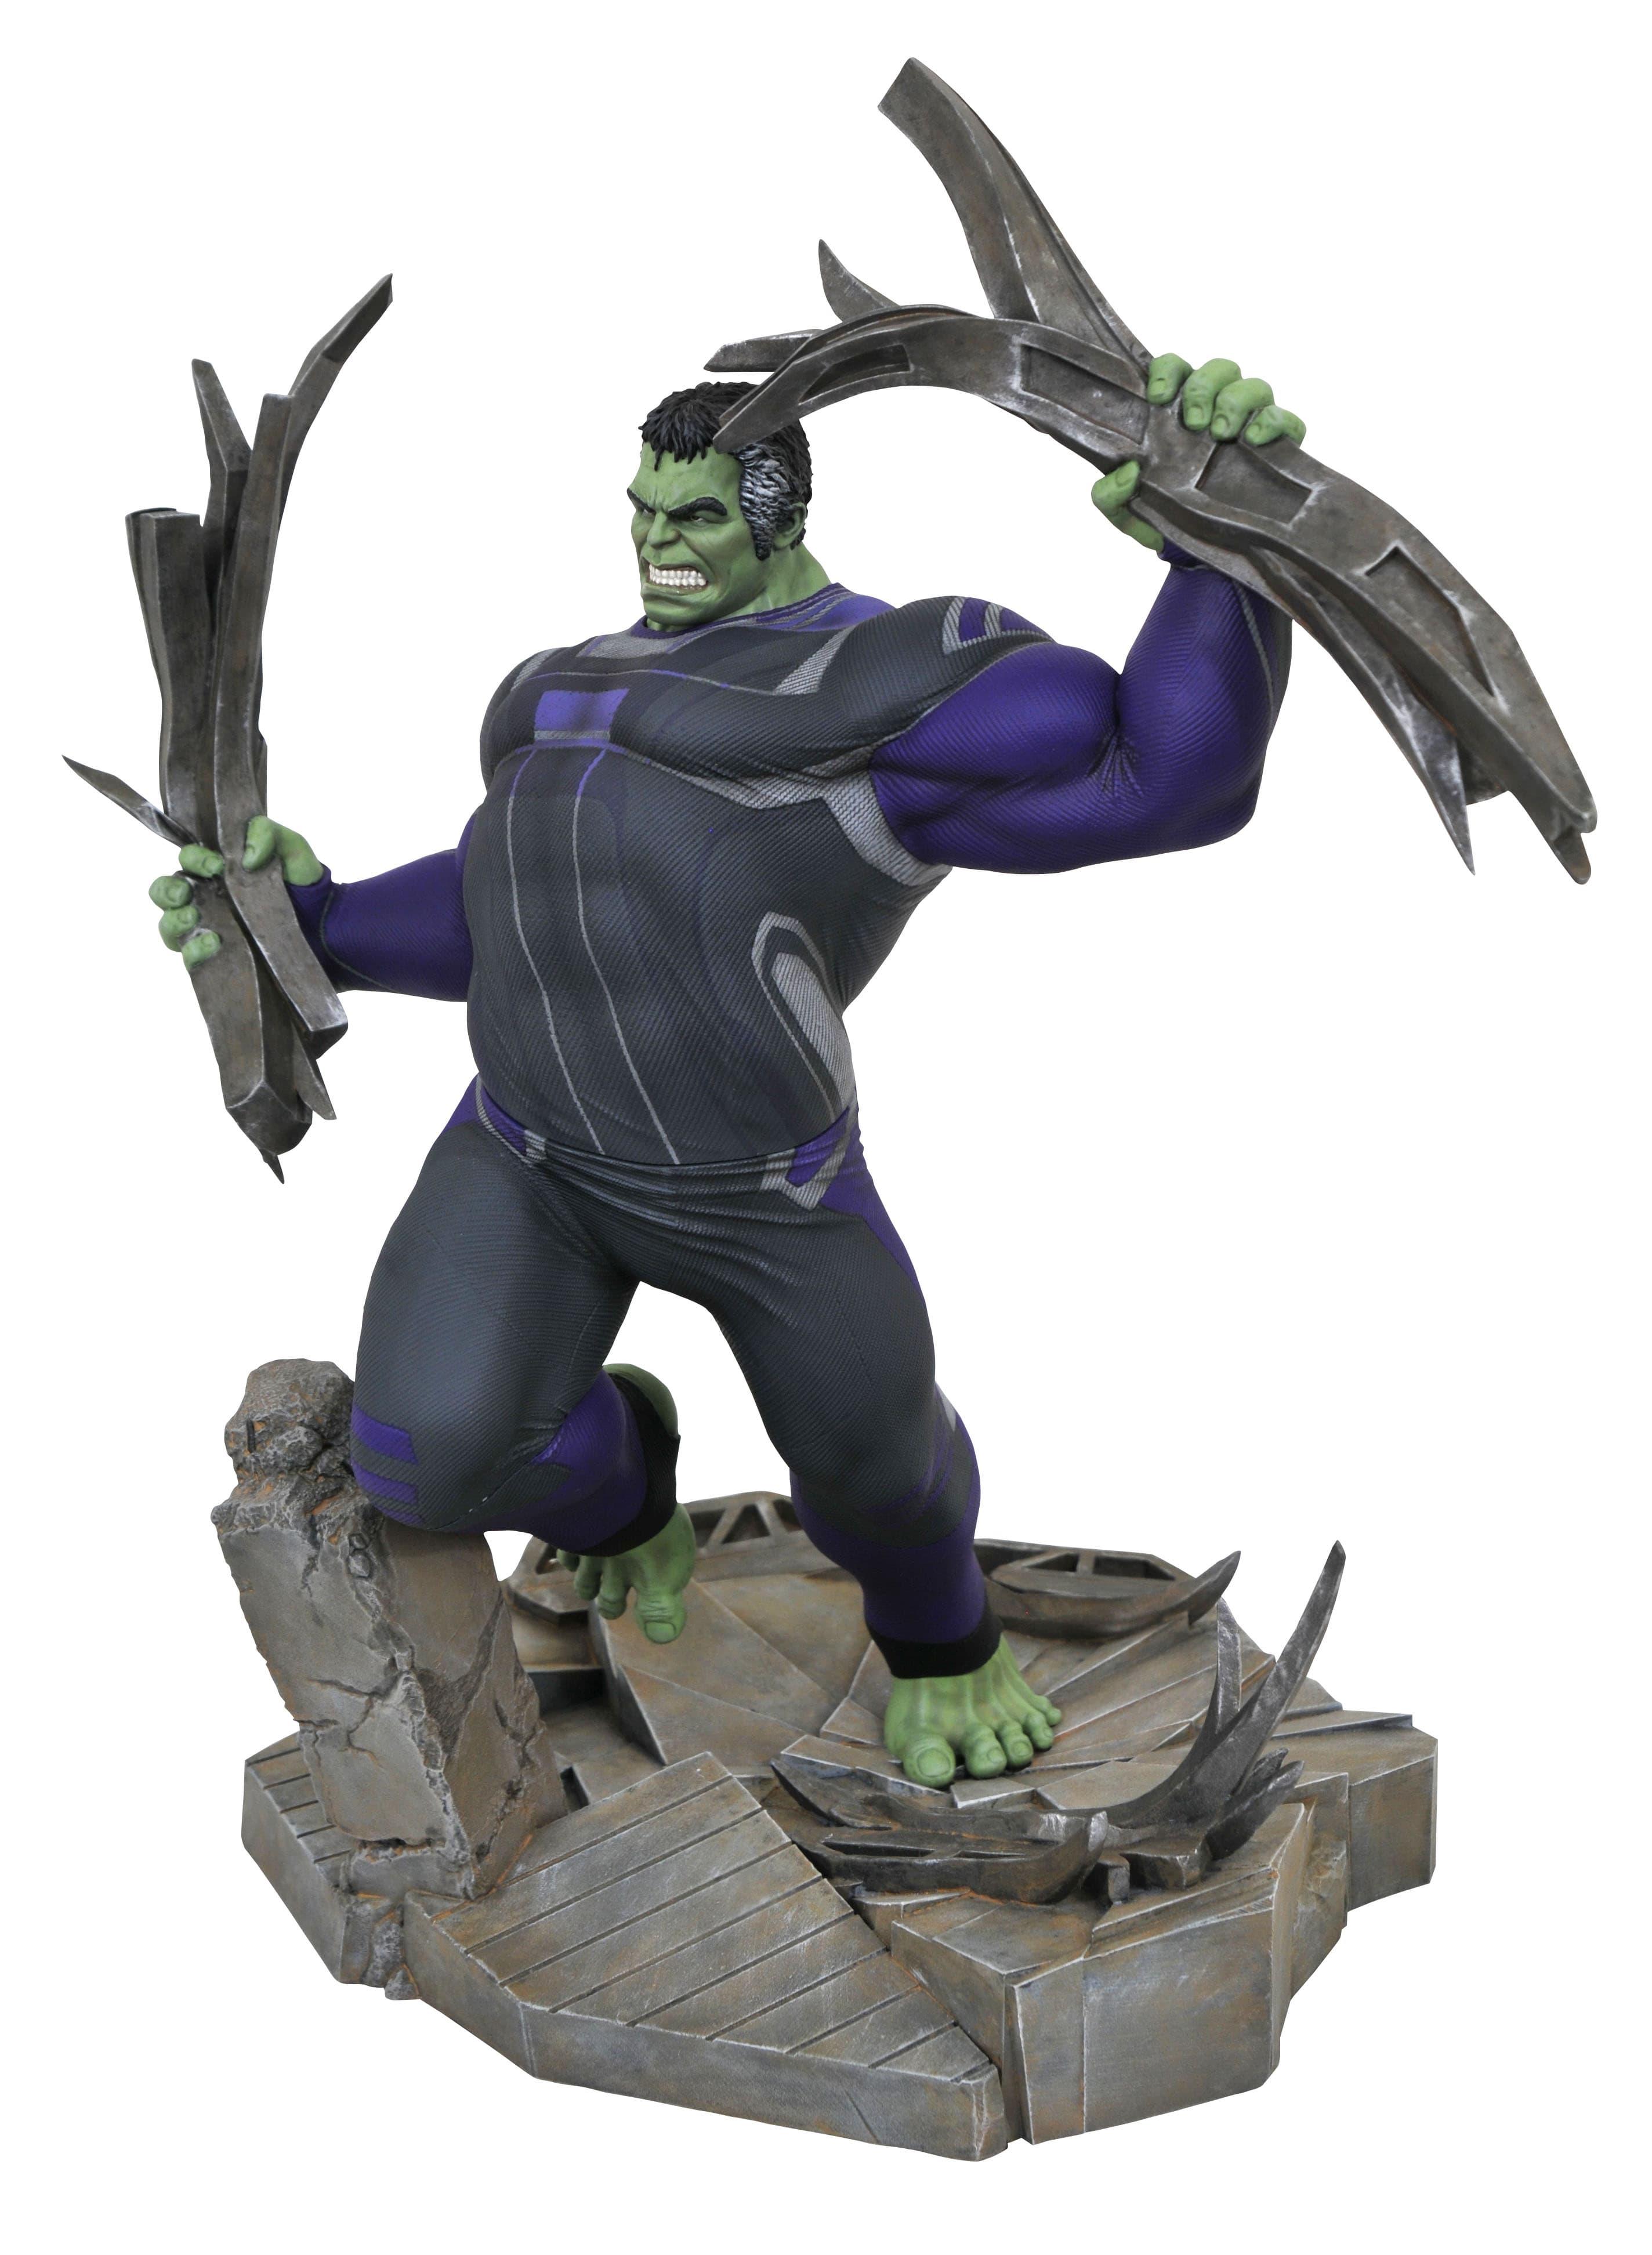 Diamond Select Hulk